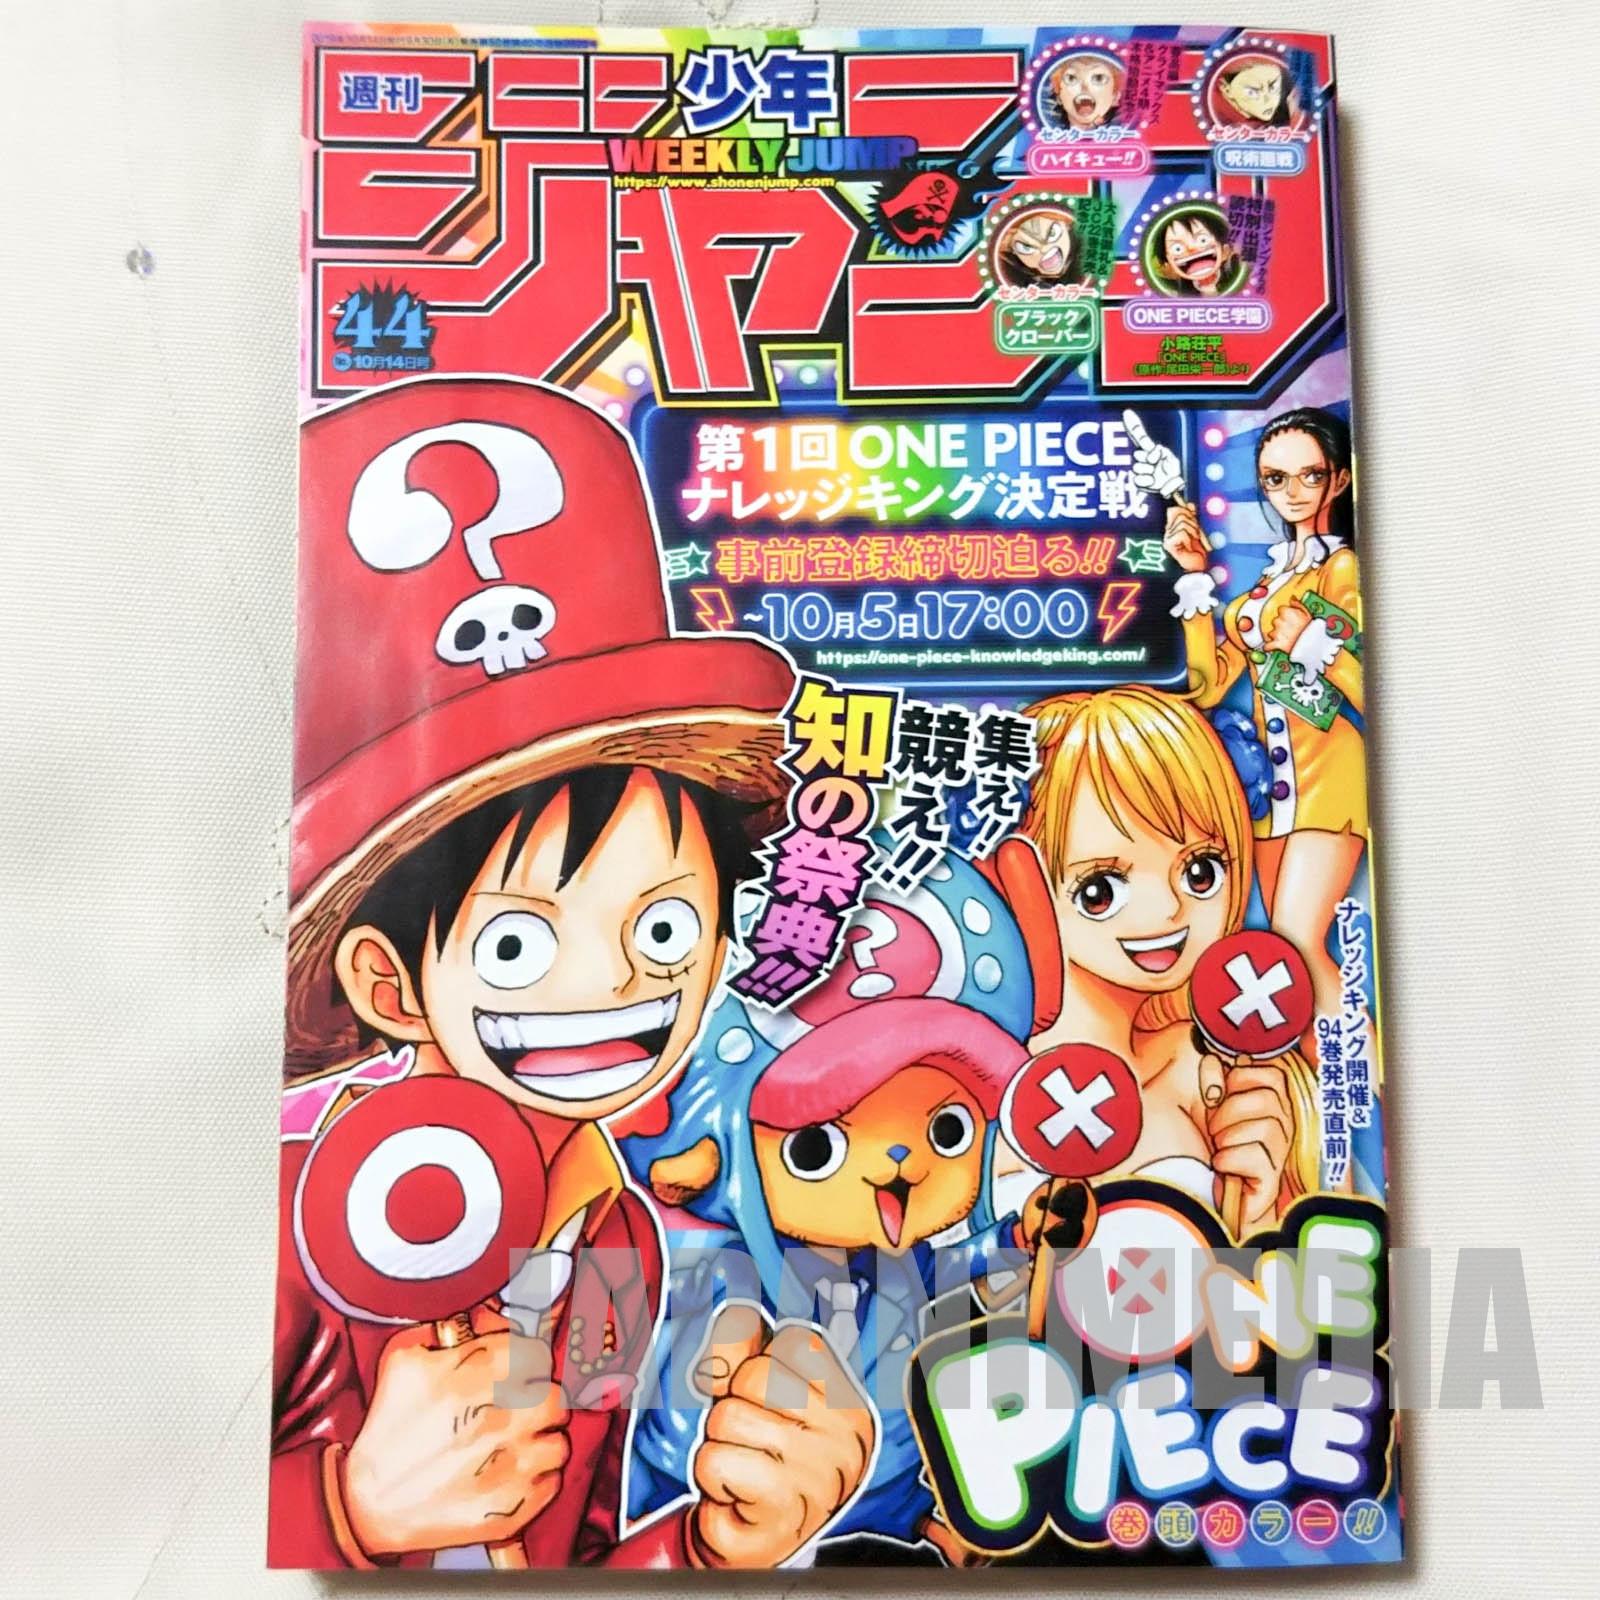 Weekly Shonen JUMP Vol.44 2019 One Piece / Japanese Magazine JAPAN MANGA